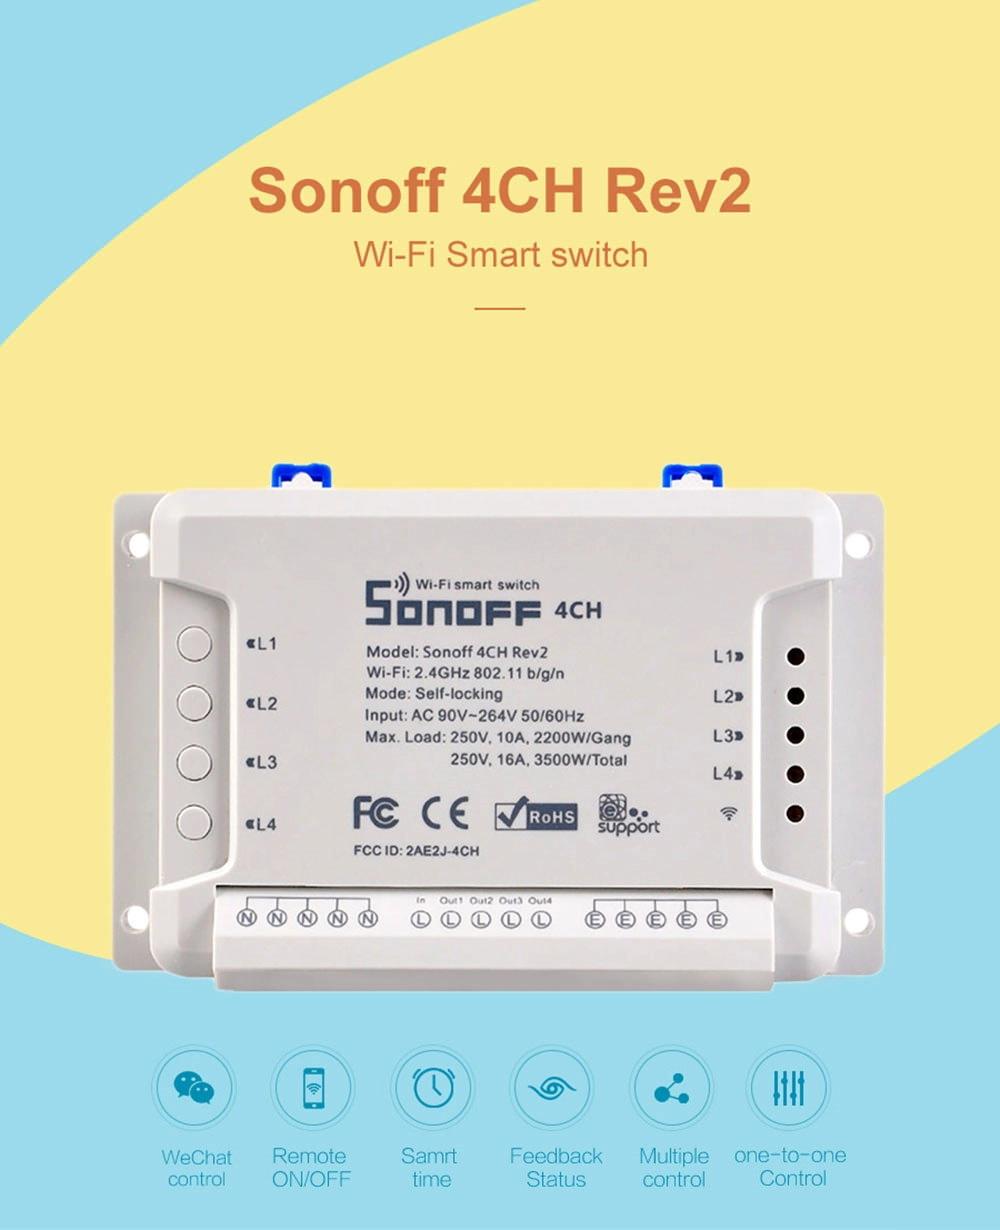 sonoff 4ch r2 smart switch